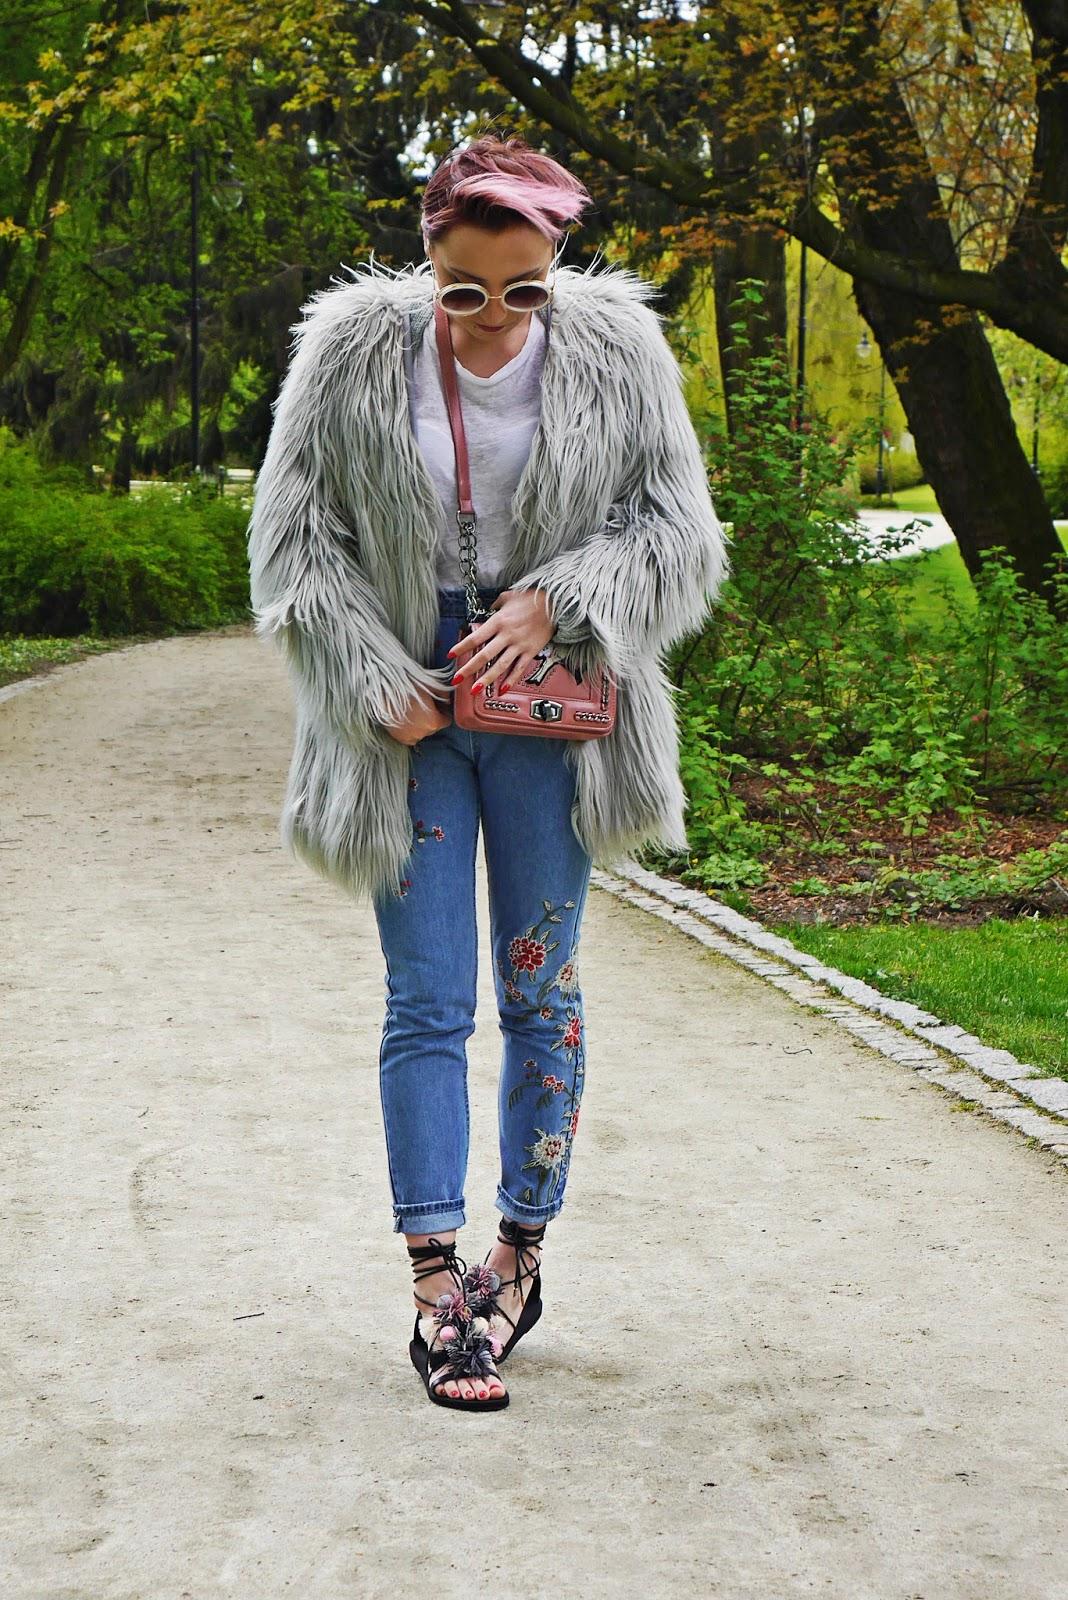 pompon_sandals_dresslily_ootd_look_karyn_blog_gray_fur_mama_jeans_020517